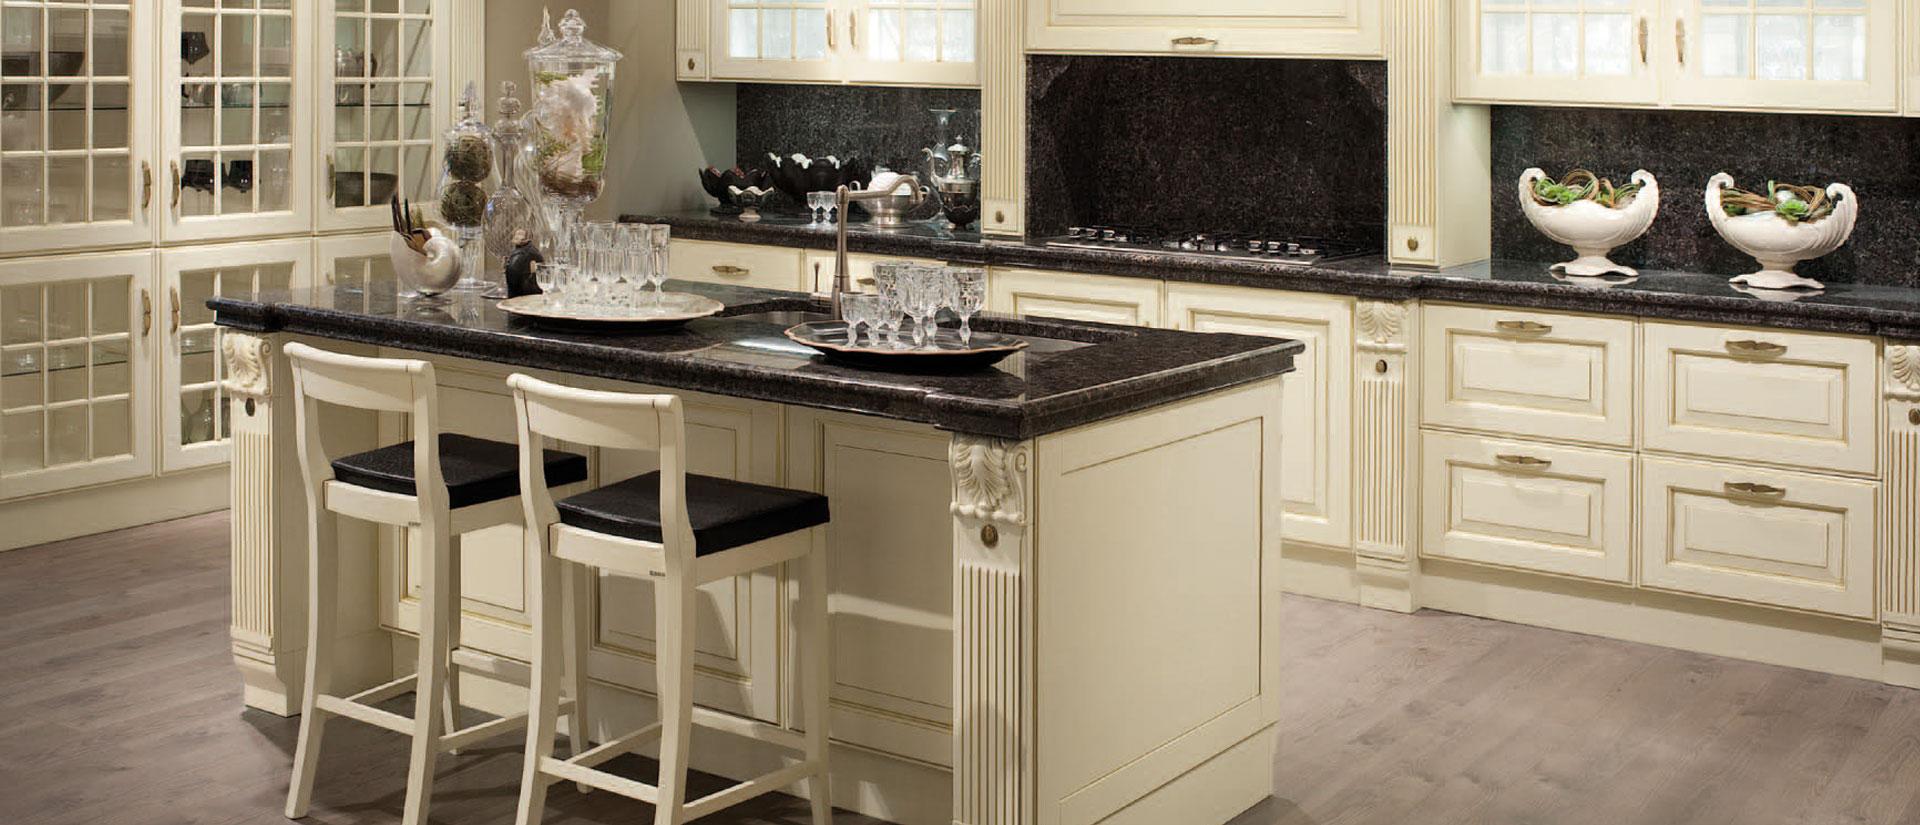 Cucina Scavolini modello Baltimora, scheda approfondita ...